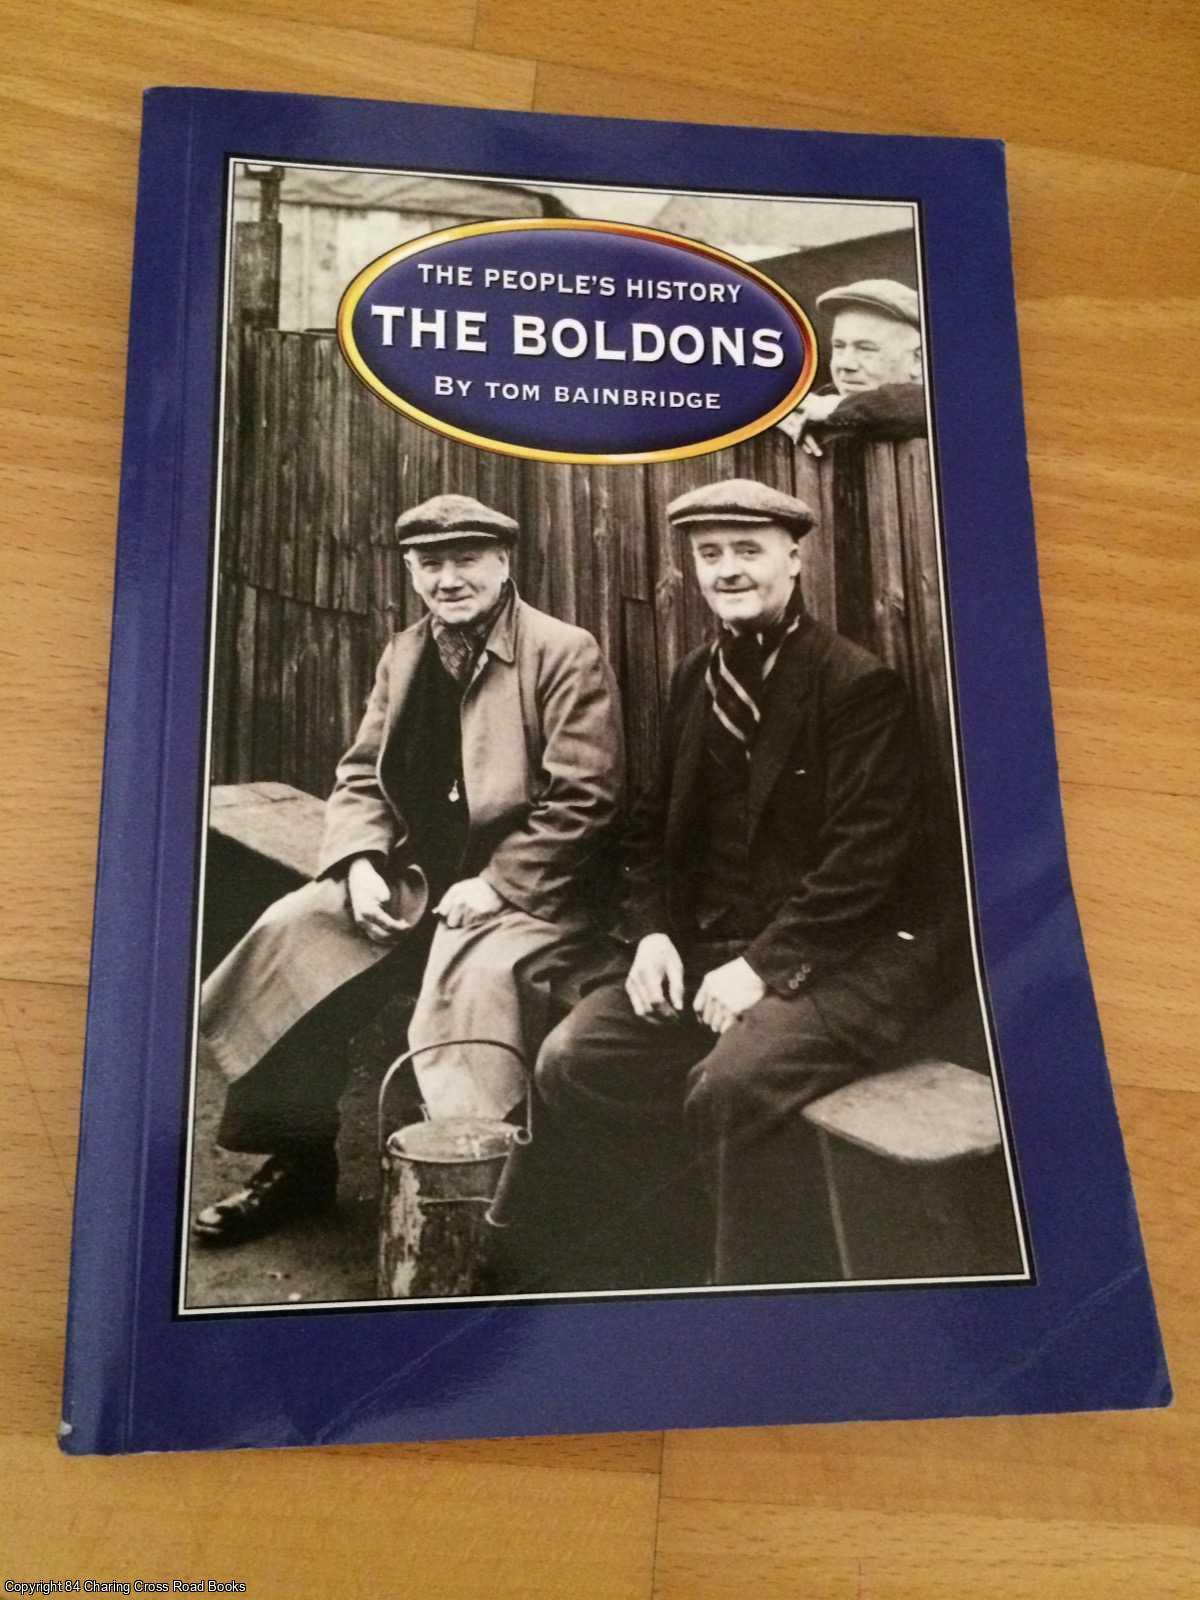 BAINBRIDGE, TOM - The Boldons